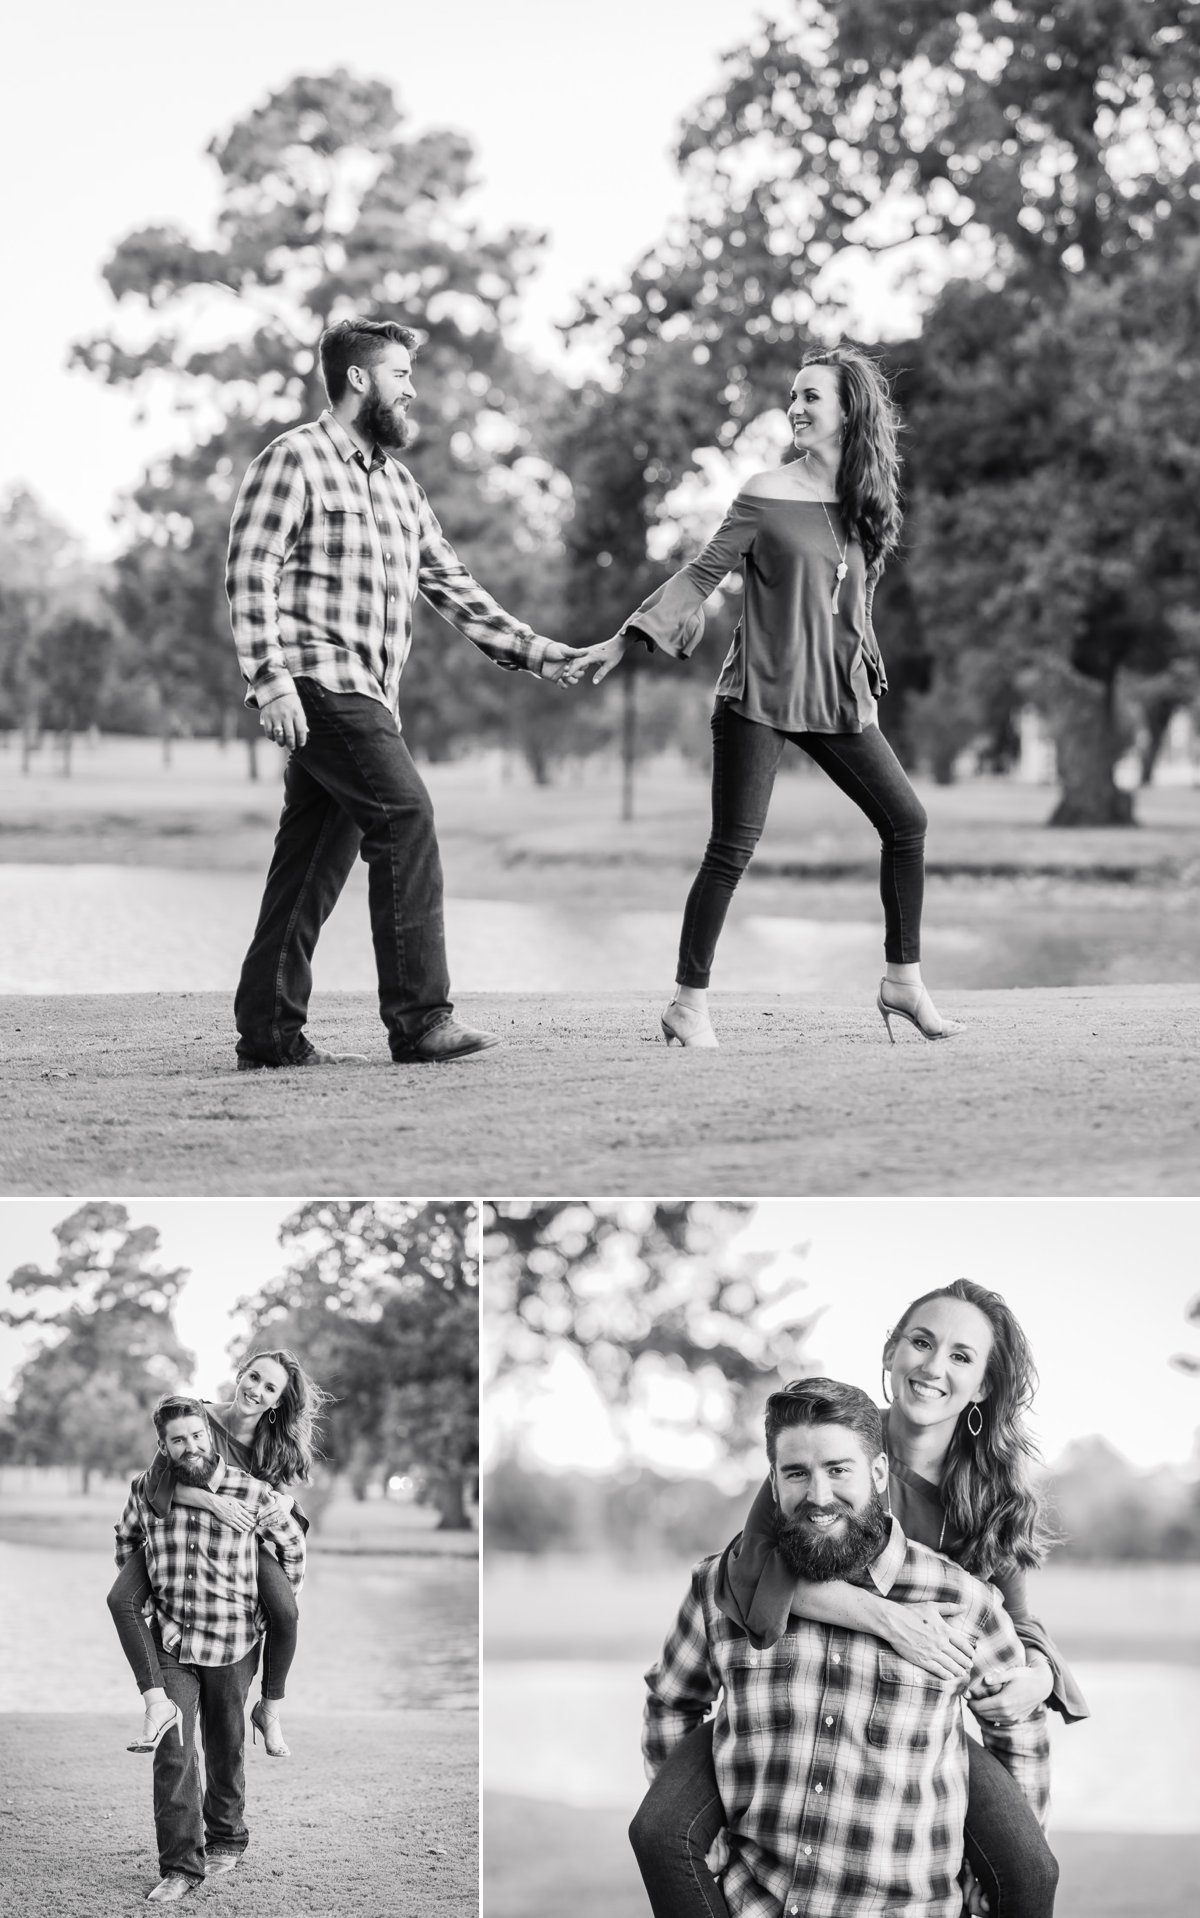 Houston Engagements Photos Black and White